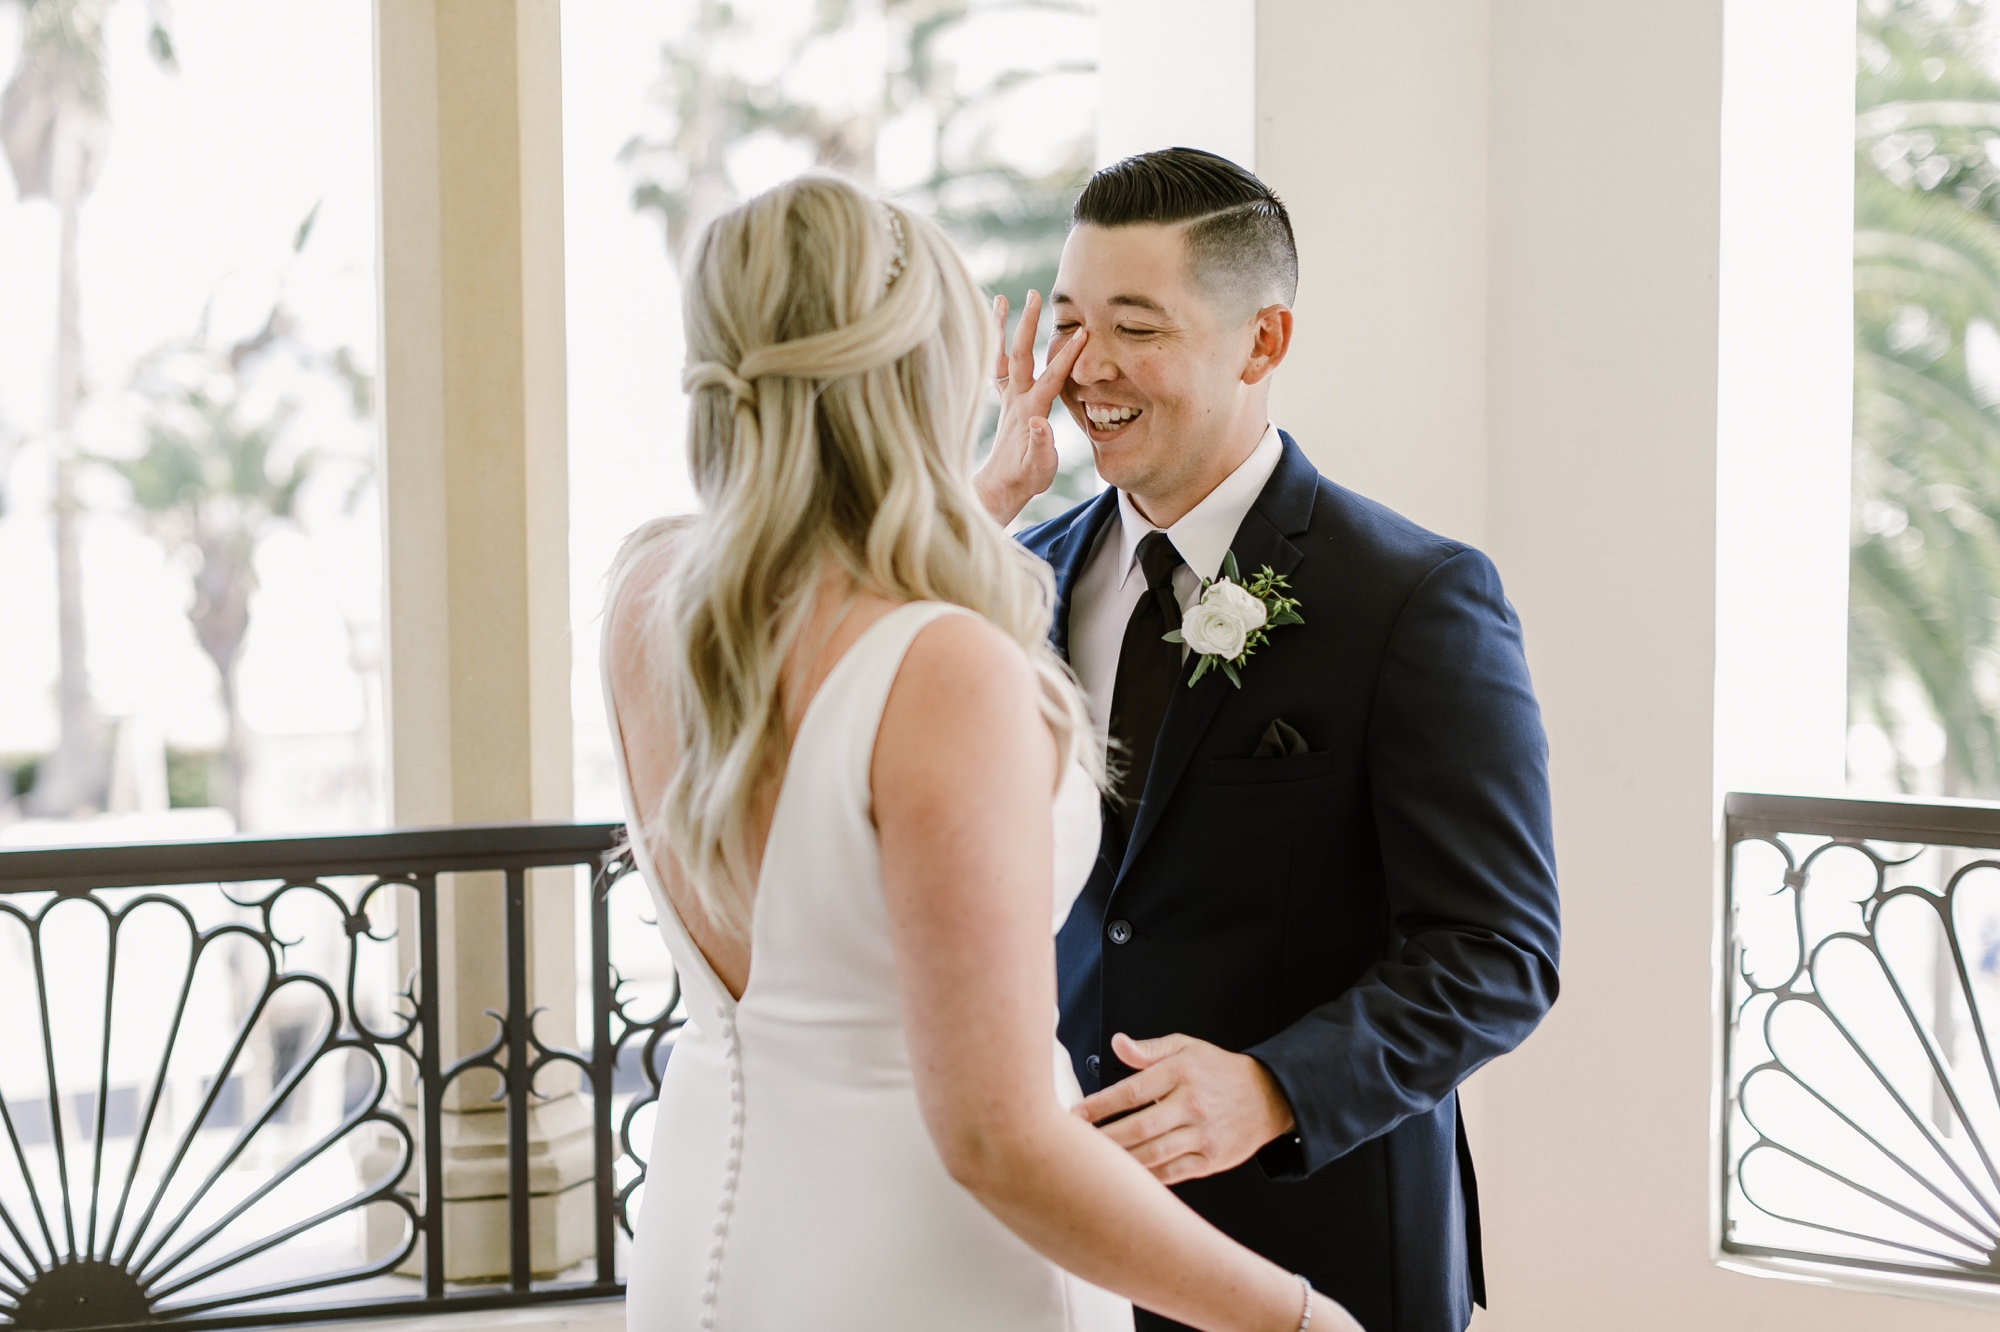 12_Ally and Tommy's Wedding-28_santa_first_look_crying_barbara_inn.jpg